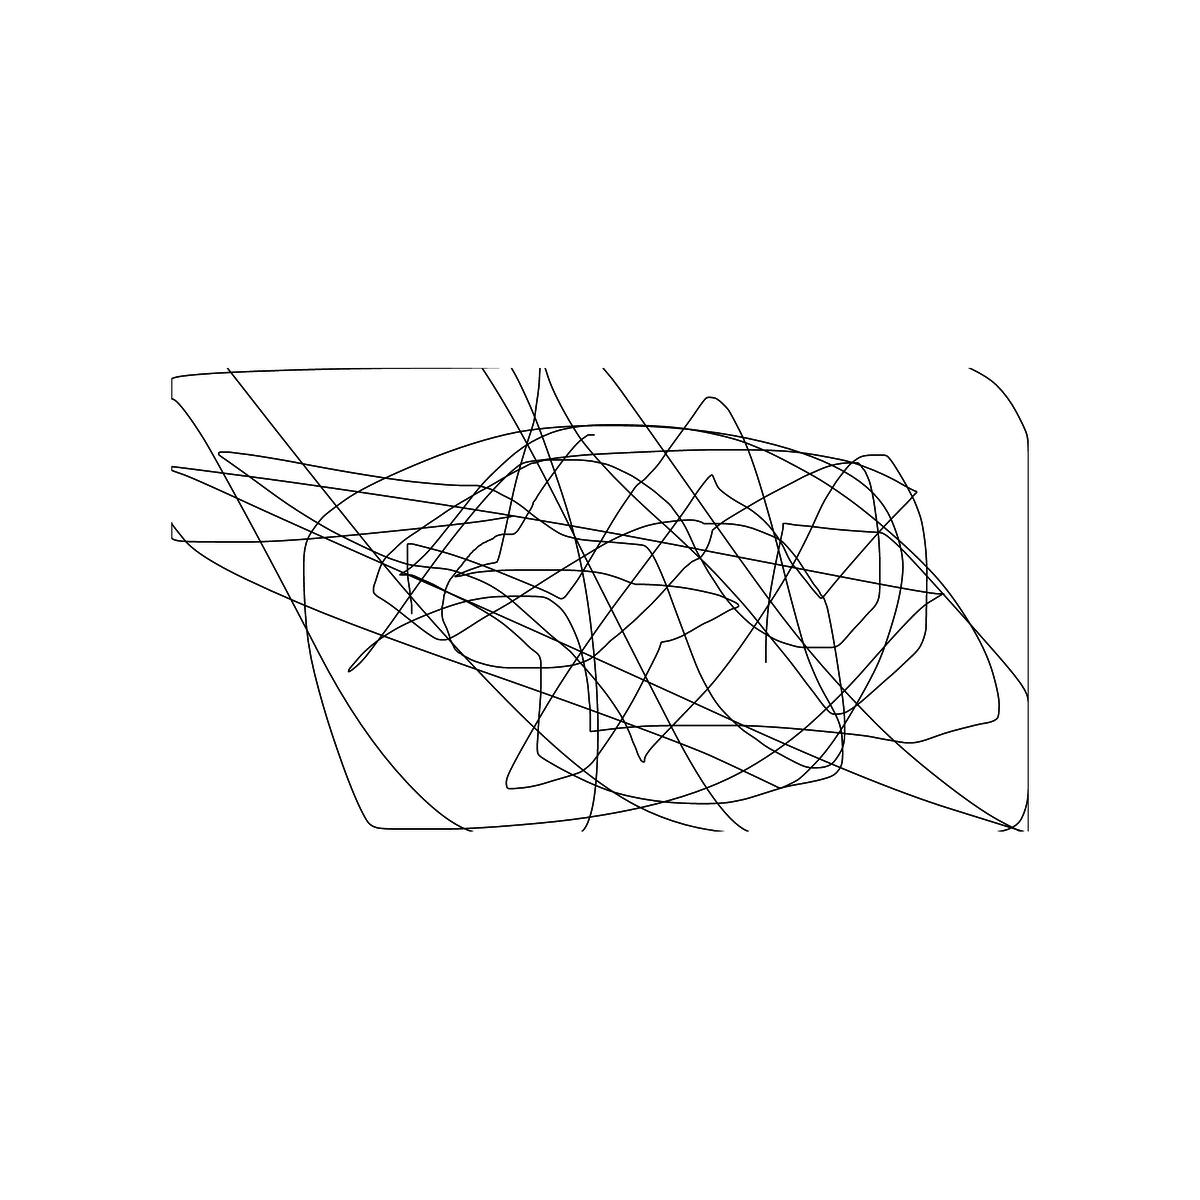 BAAAM drawing#4971 lat:-28.0337257385253900lng: 153.2968750000000000